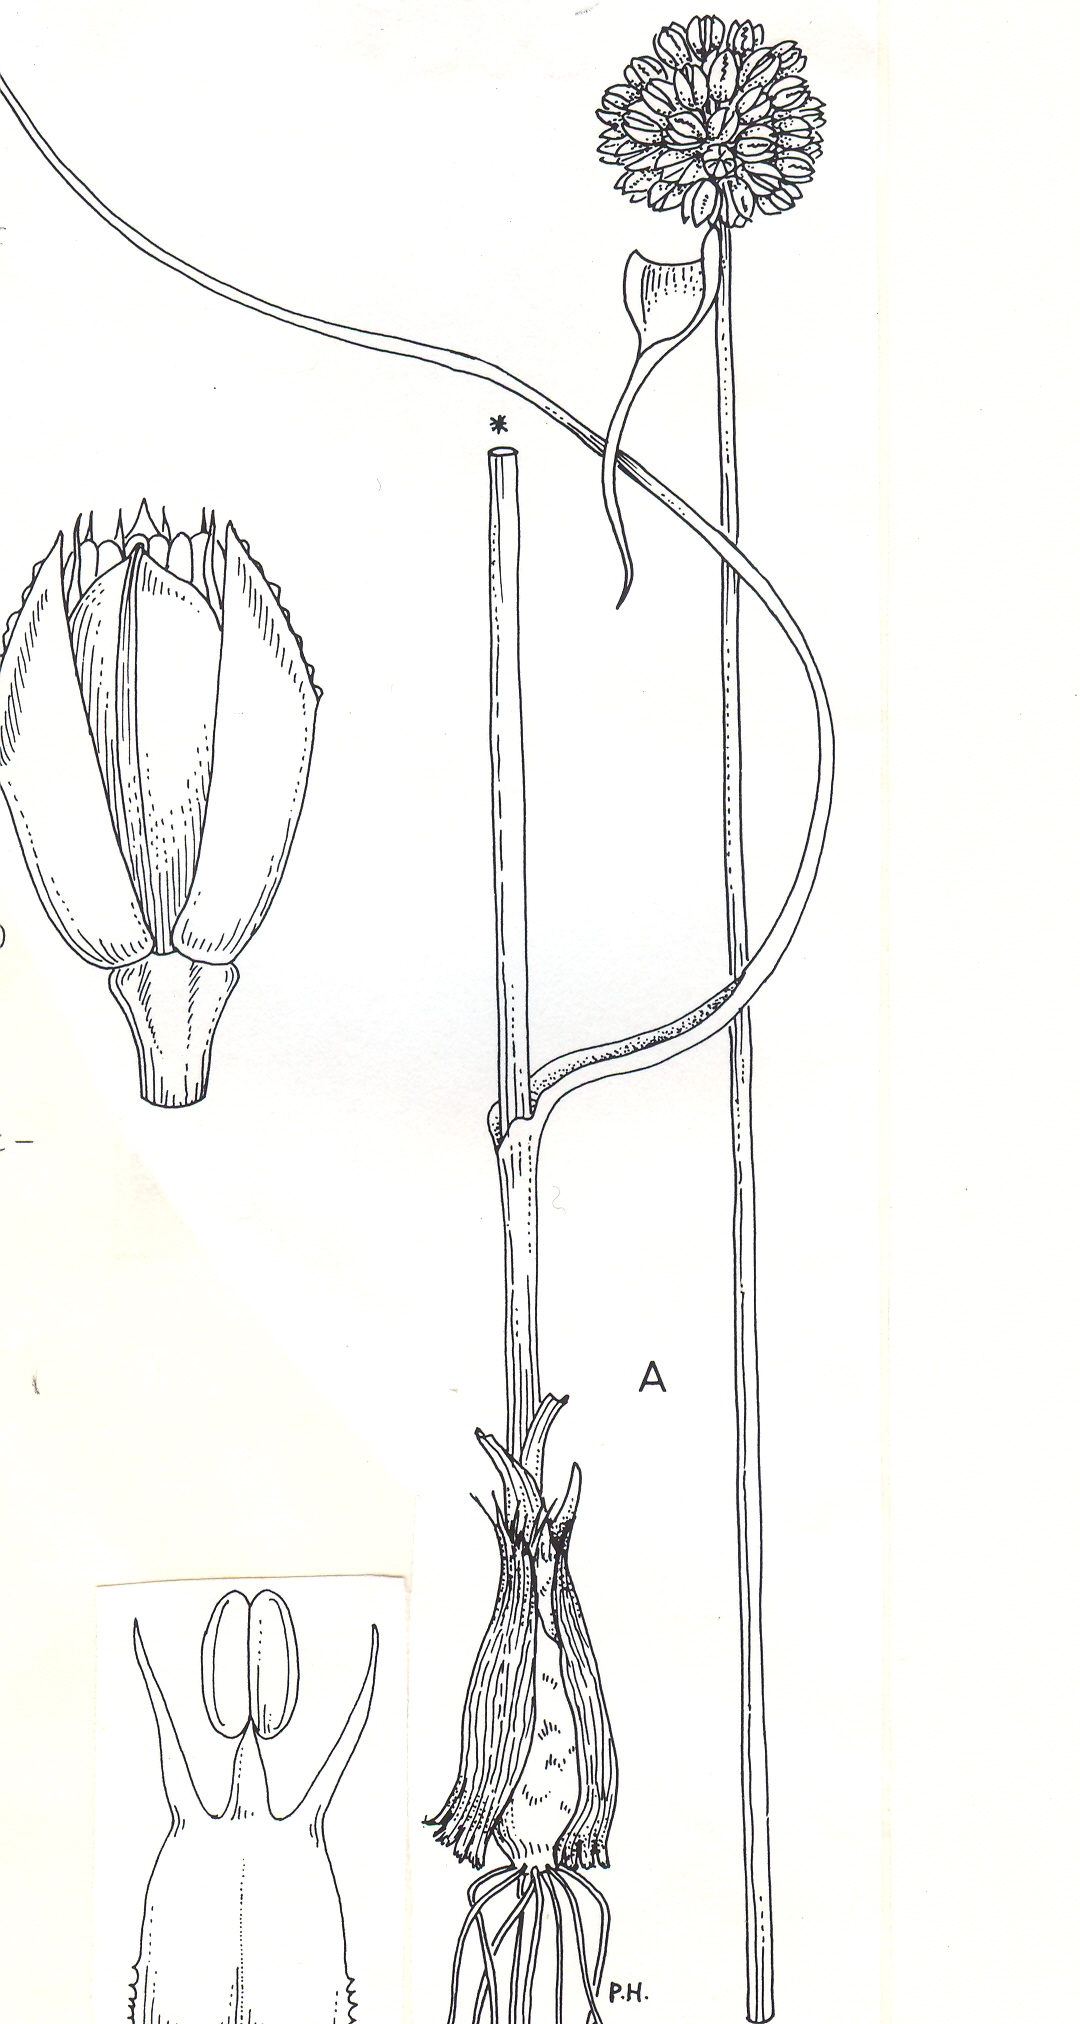 Allium%20asirense.jpg